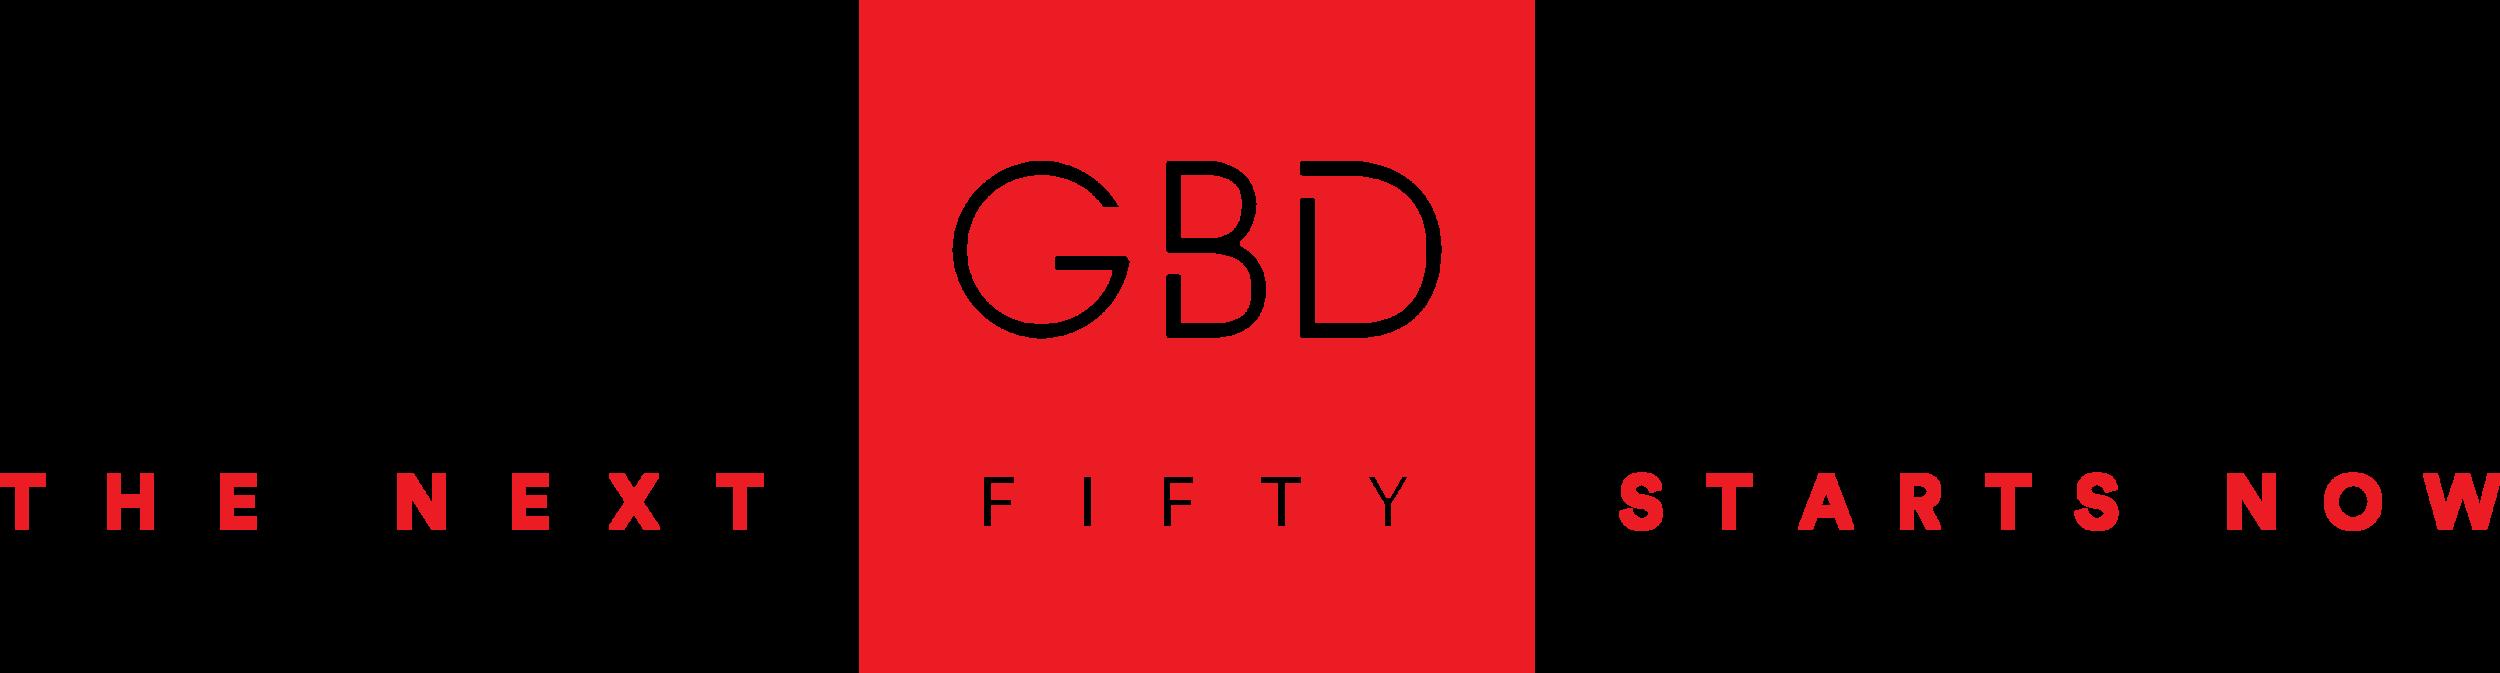 GBD logo.png